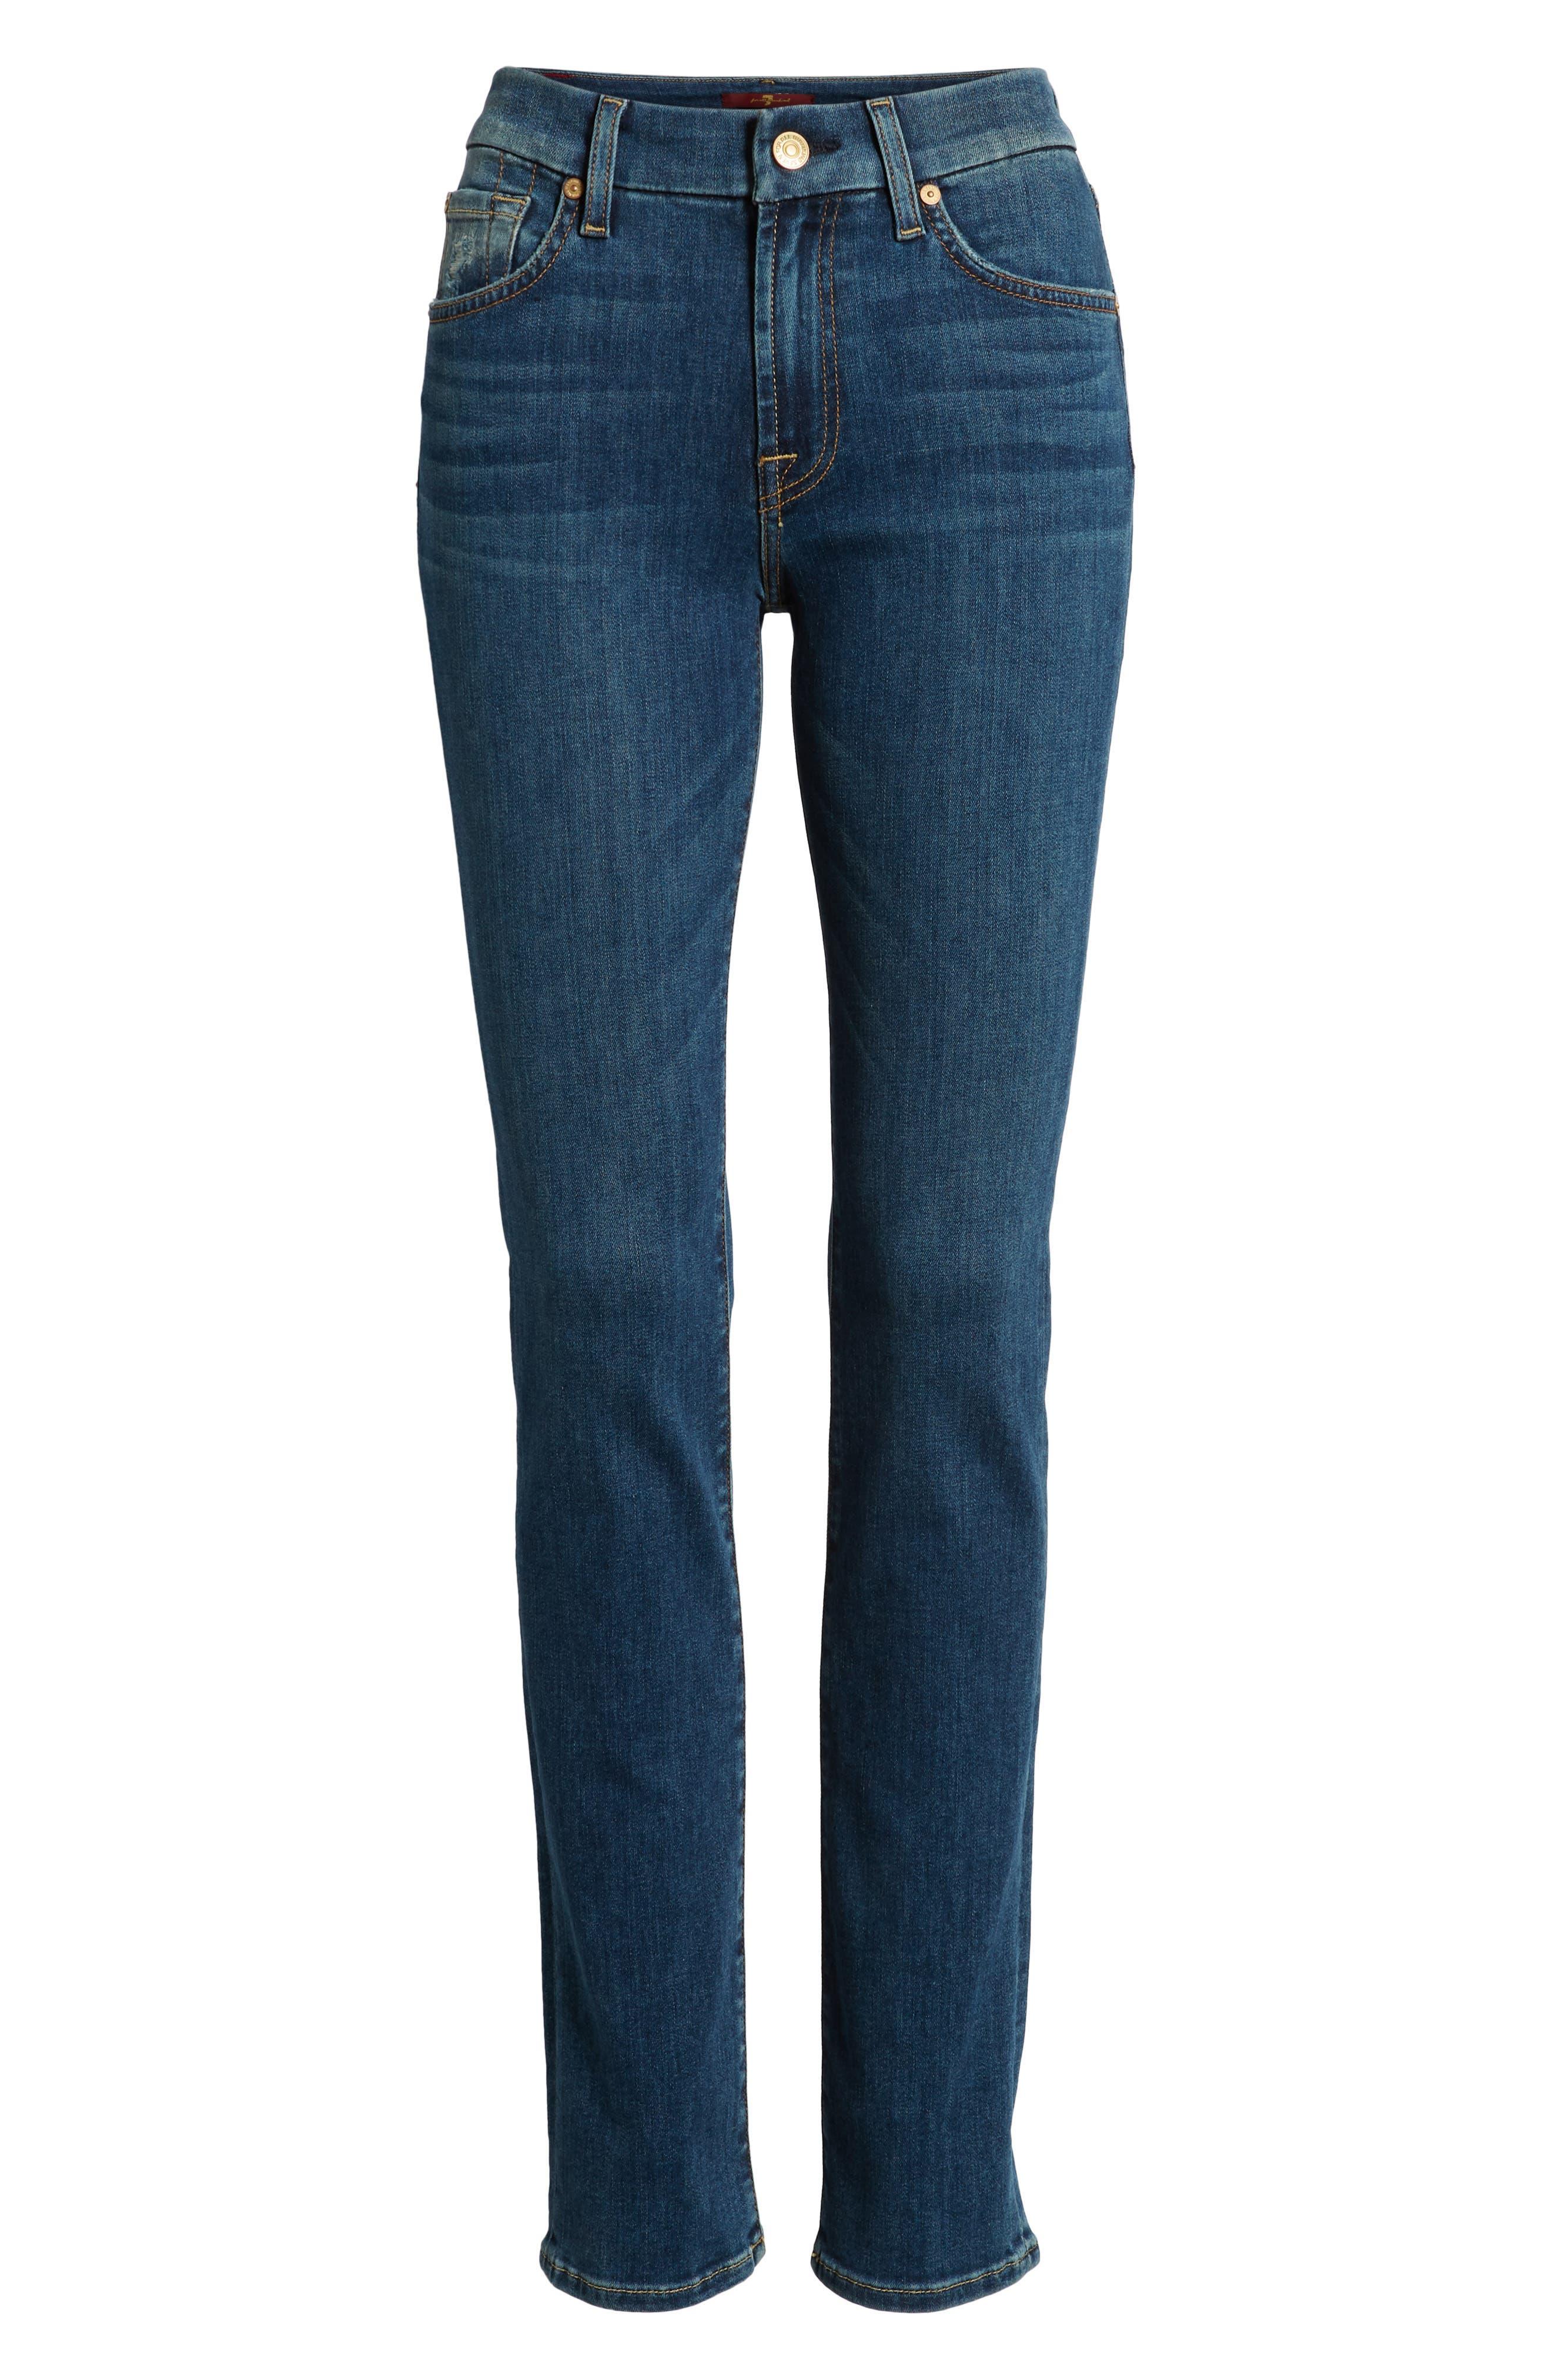 Kimmie Straight Leg Jeans,                             Alternate thumbnail 7, color,                             GLAM MEDIUM